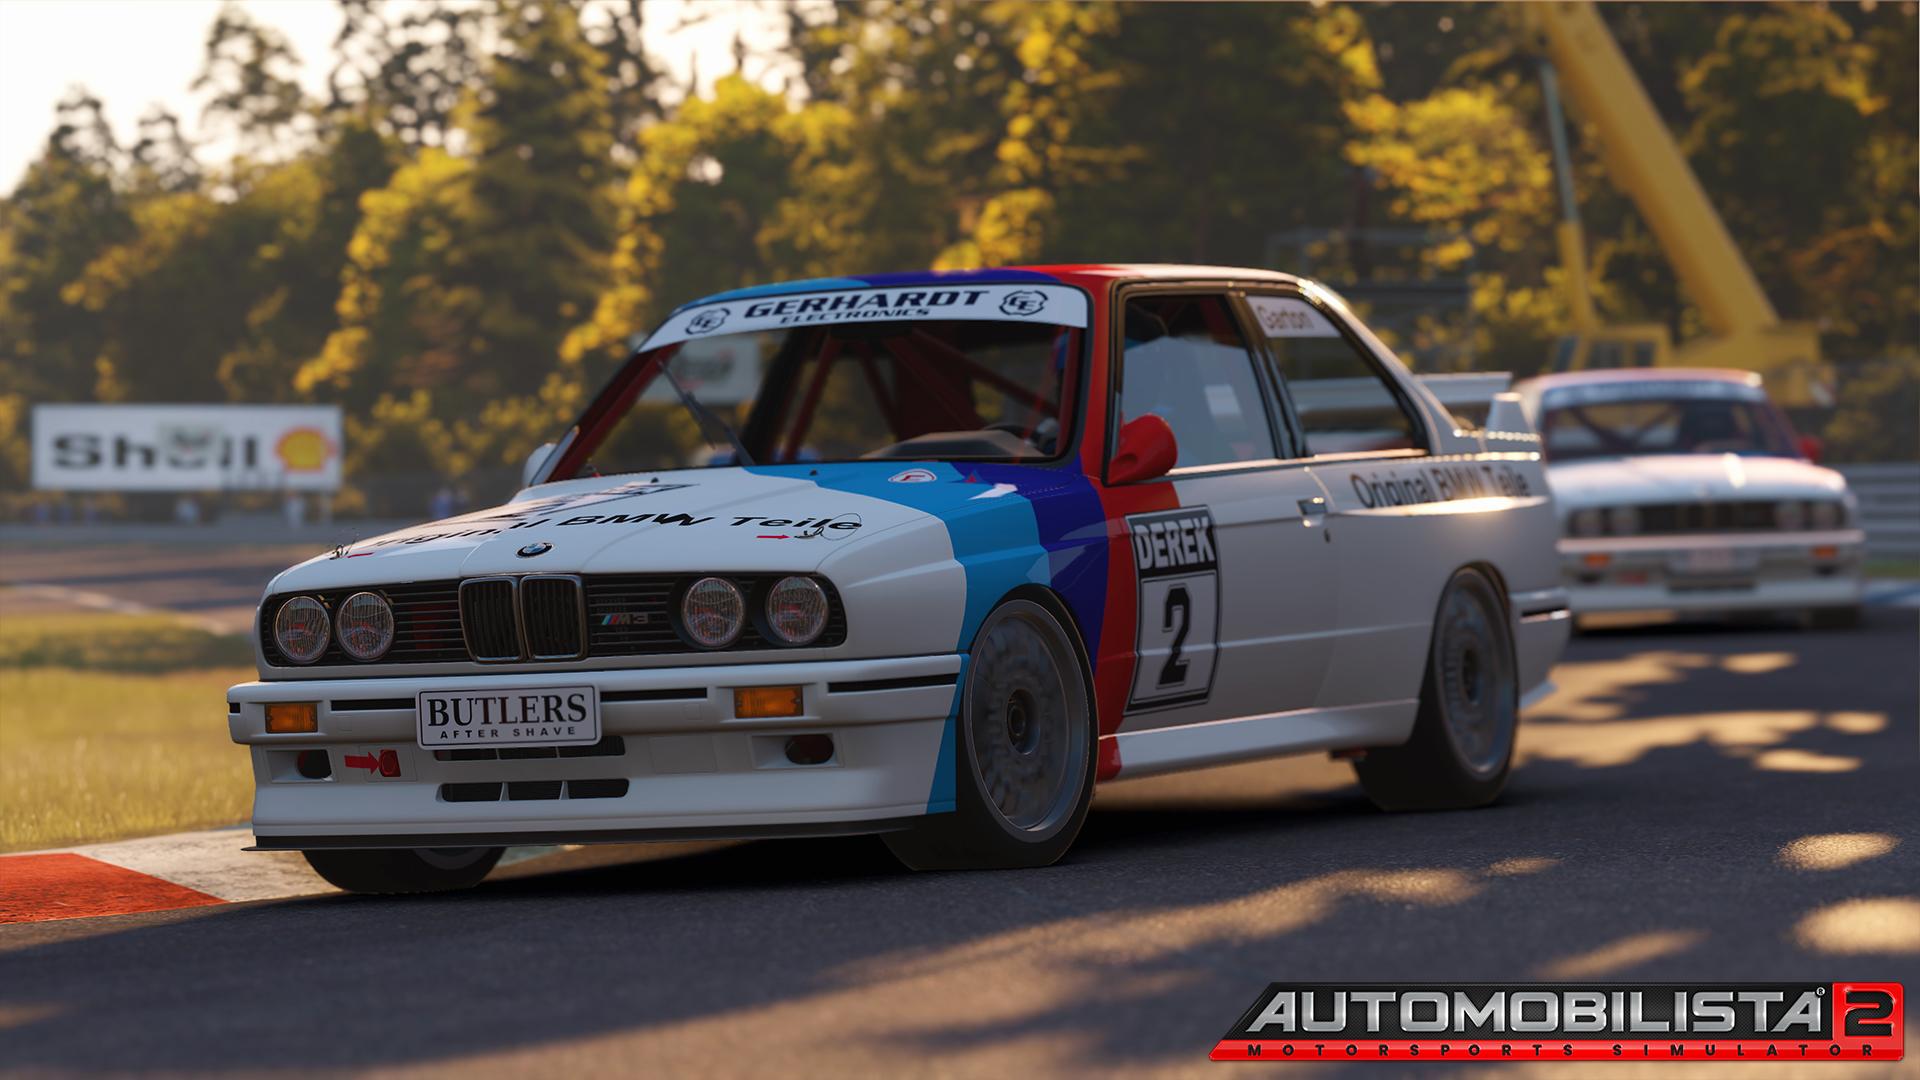 Automobilista 2: Classic Touring arrives tomorrow